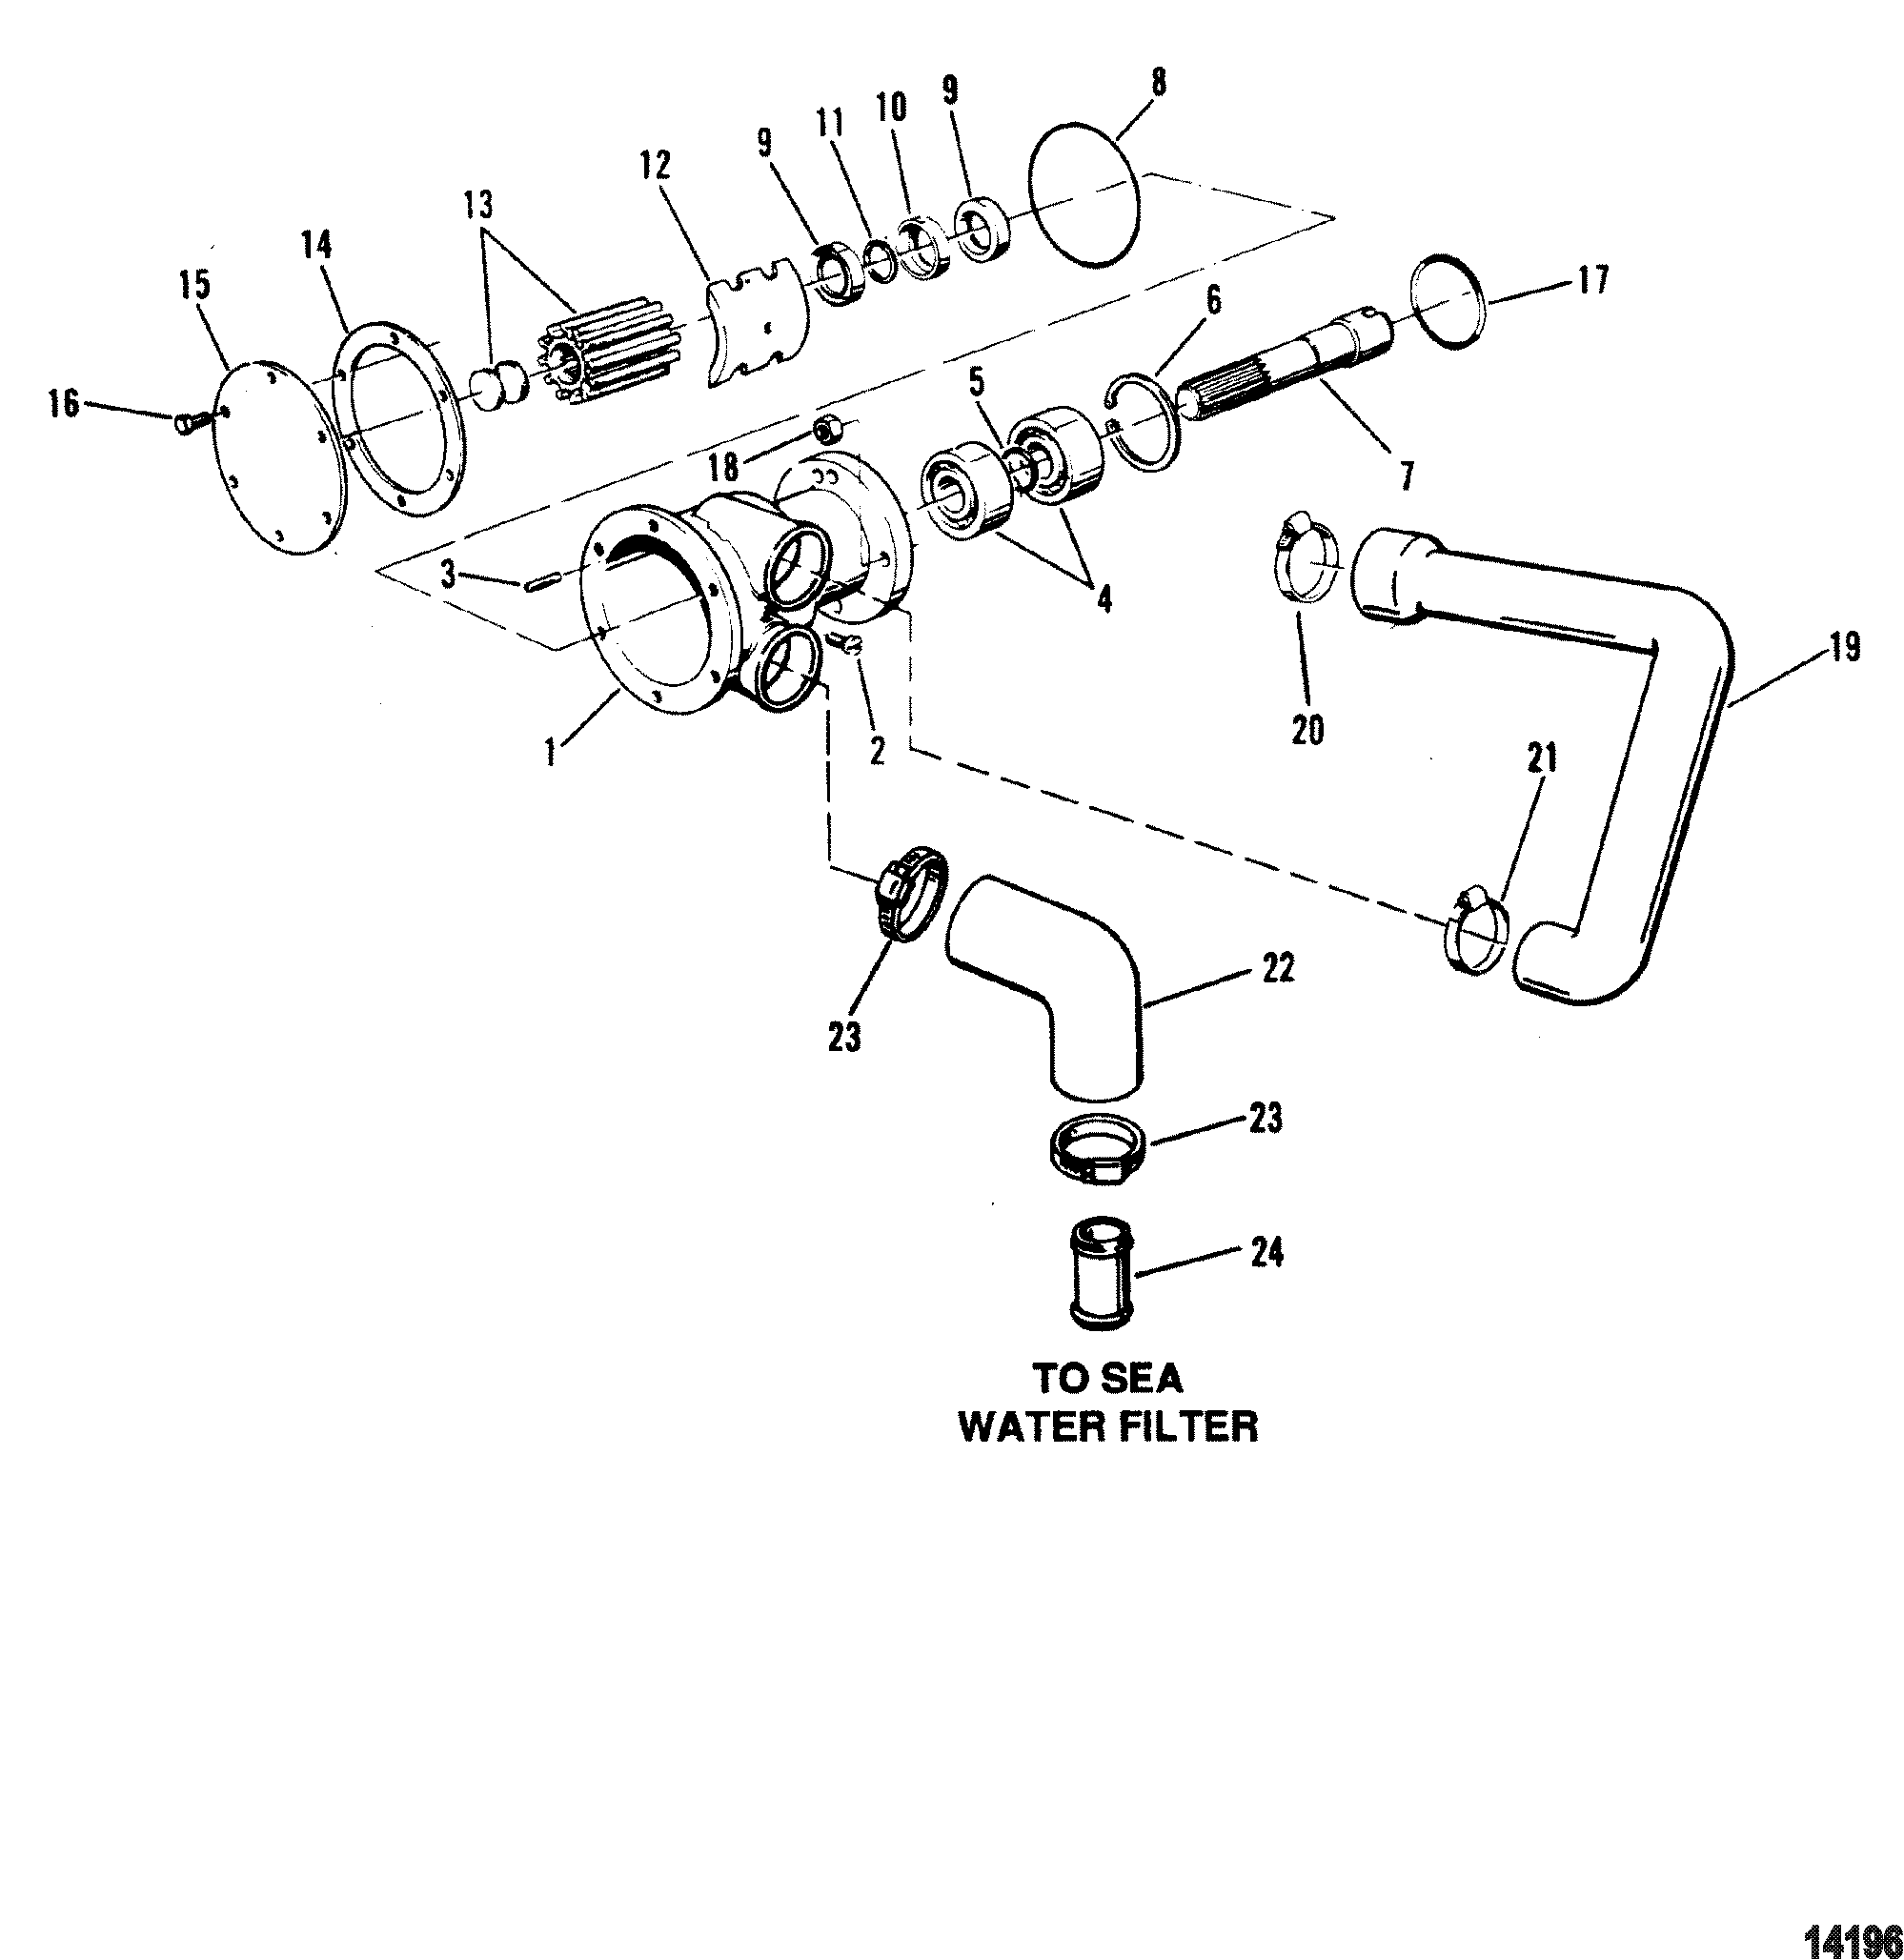 Каталог запчастей MERCRUISER остальные D3 0L (BRAVO) VM 183